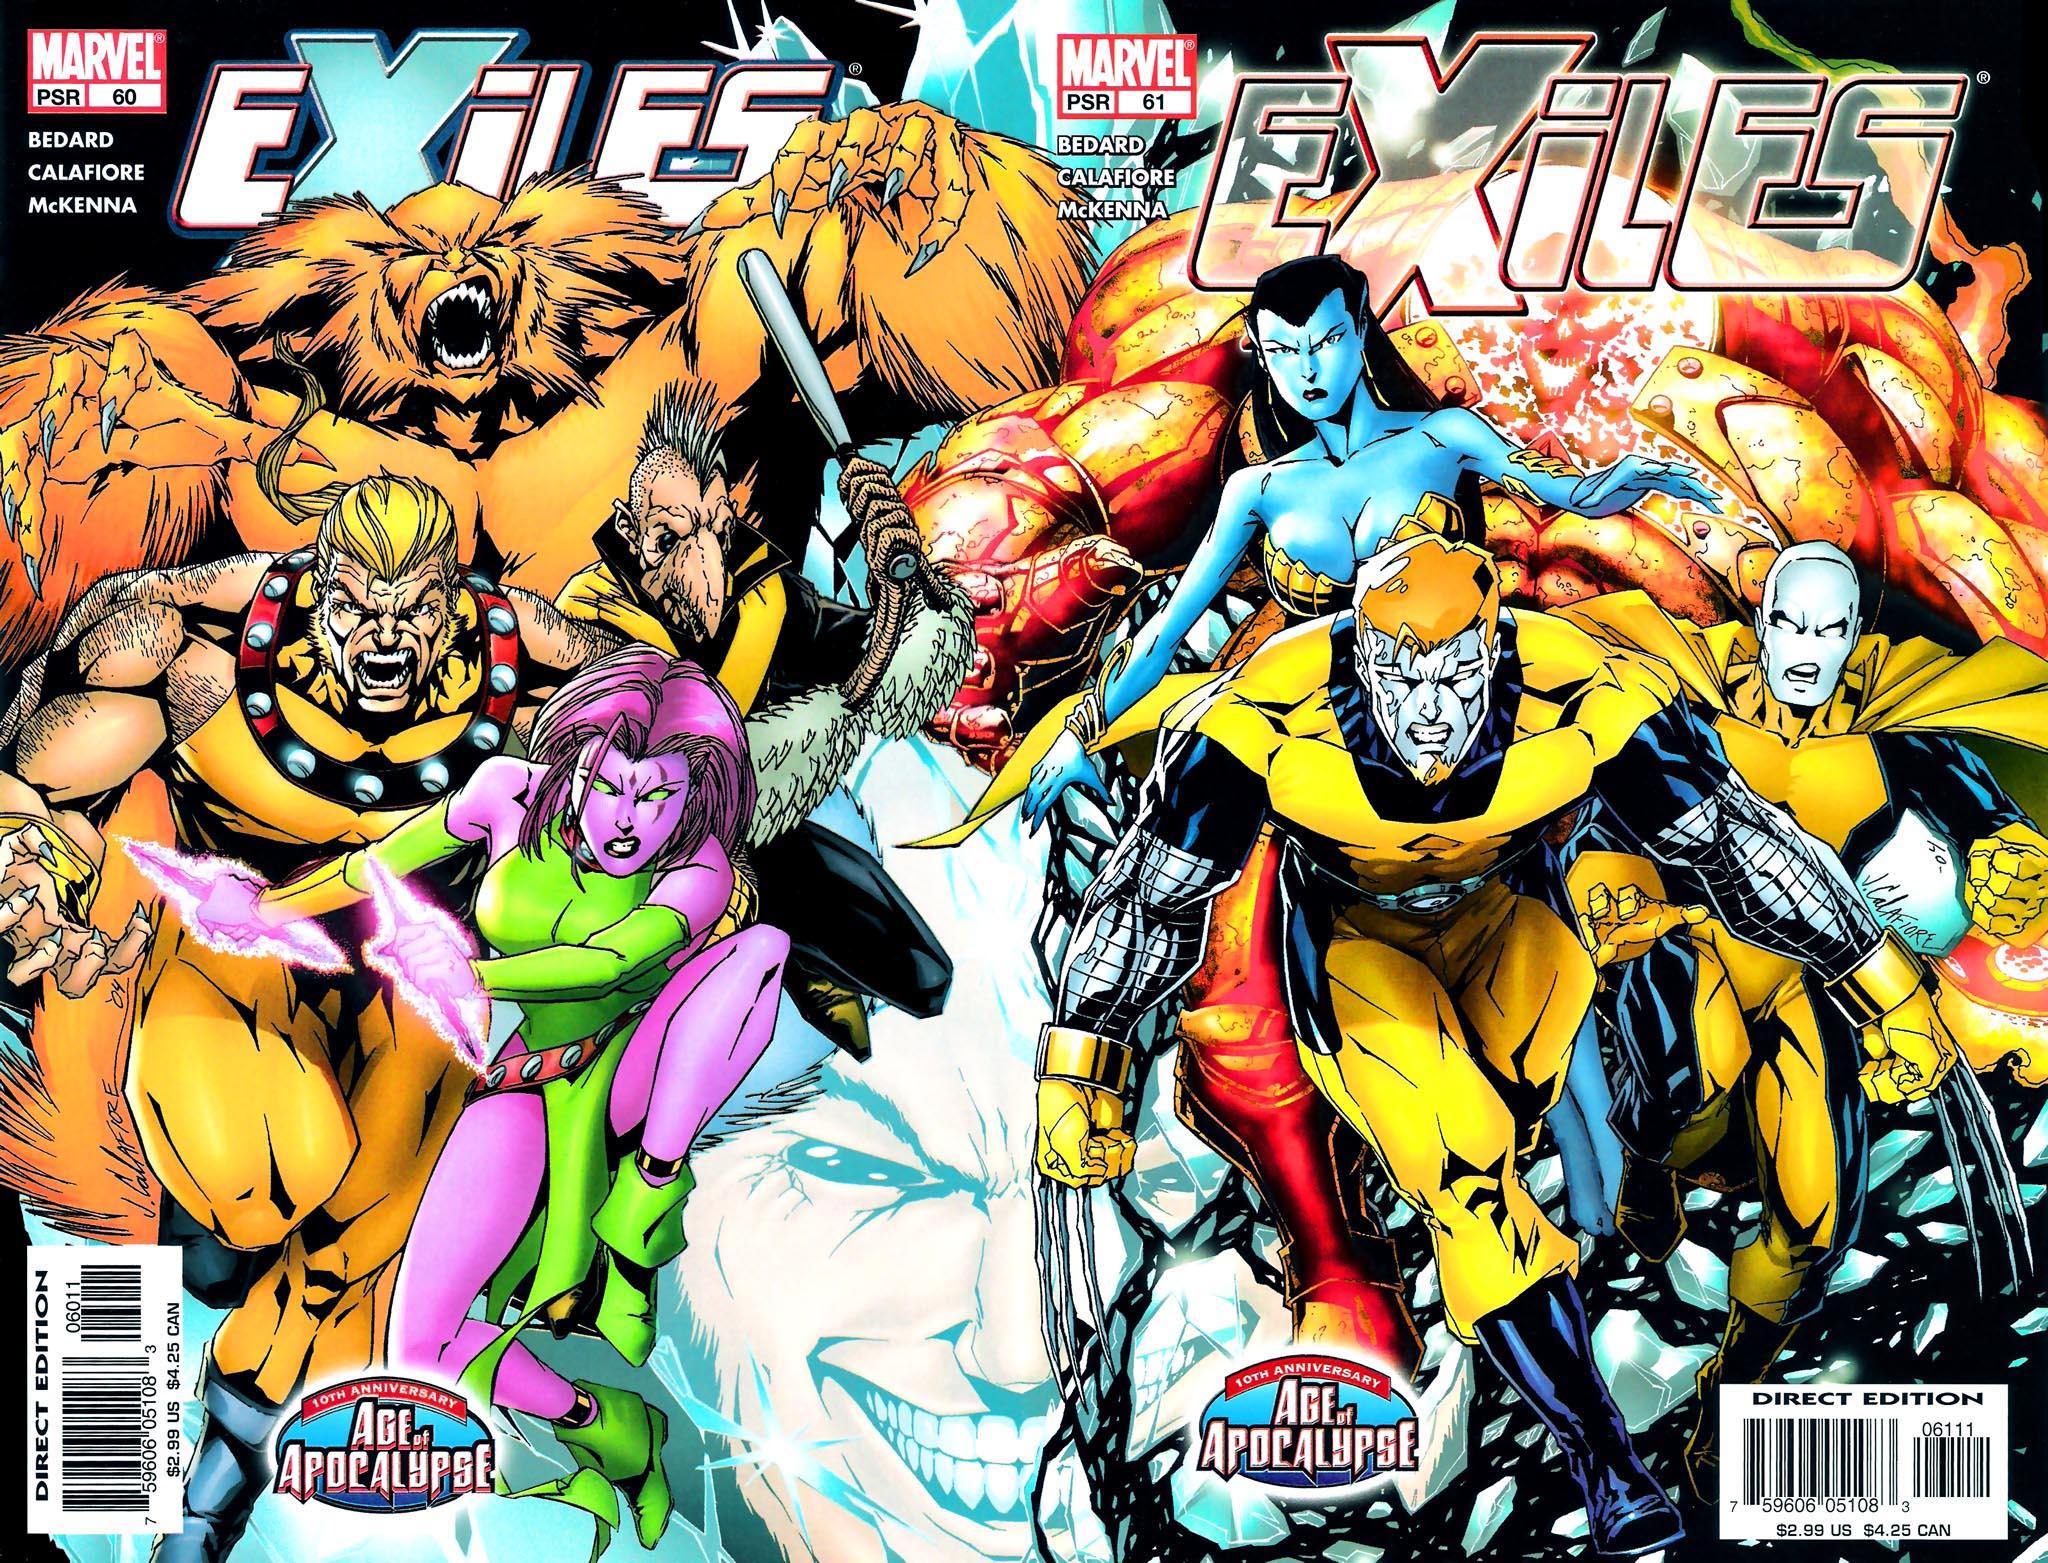 Exiles Vol 1 61 - Marvel Datab...